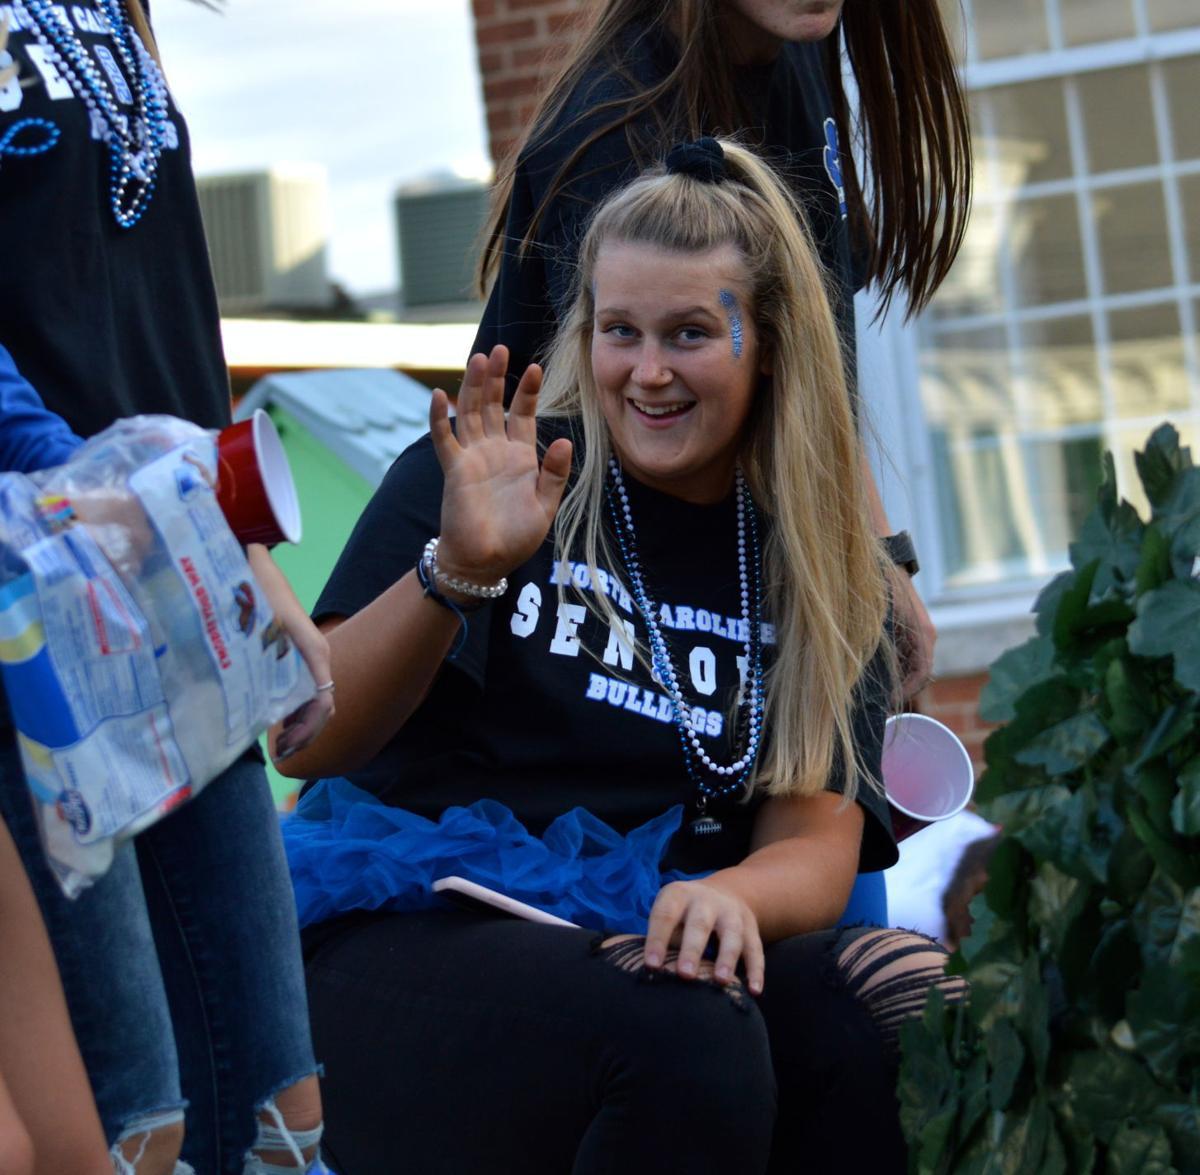 2019 North Caroline High School Homecoming Parade